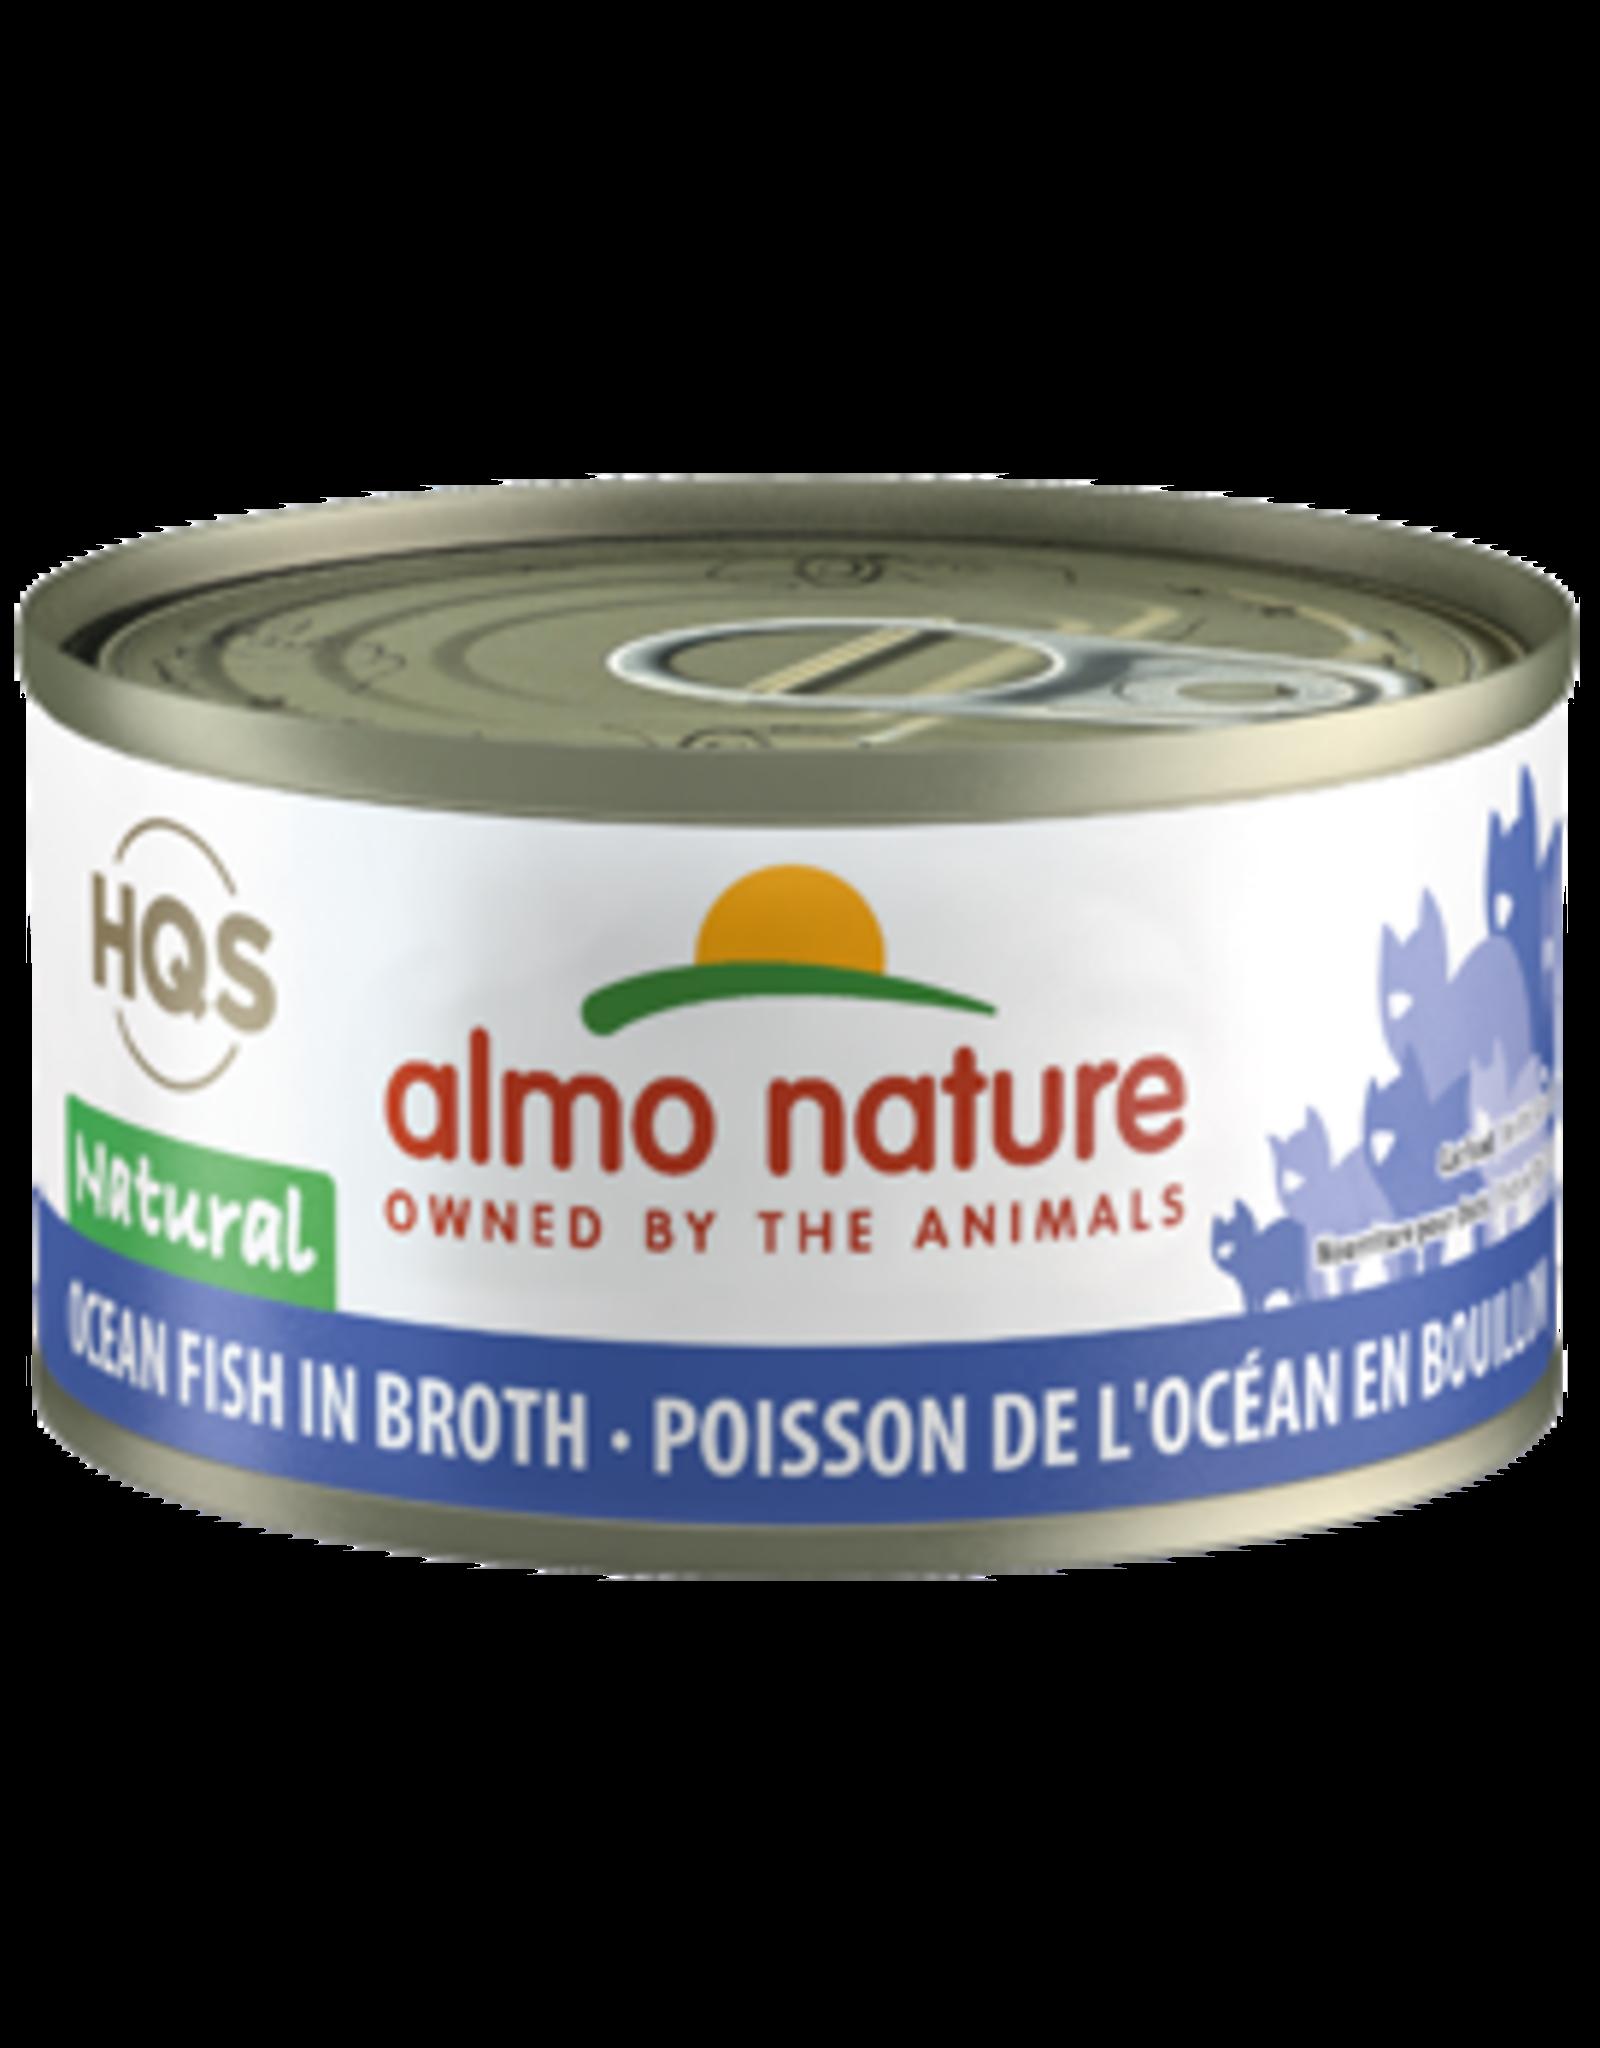 Almo Nature Almo Nature HQS Natural Ocean Fish in Broth Cat Food 2.47 Oz